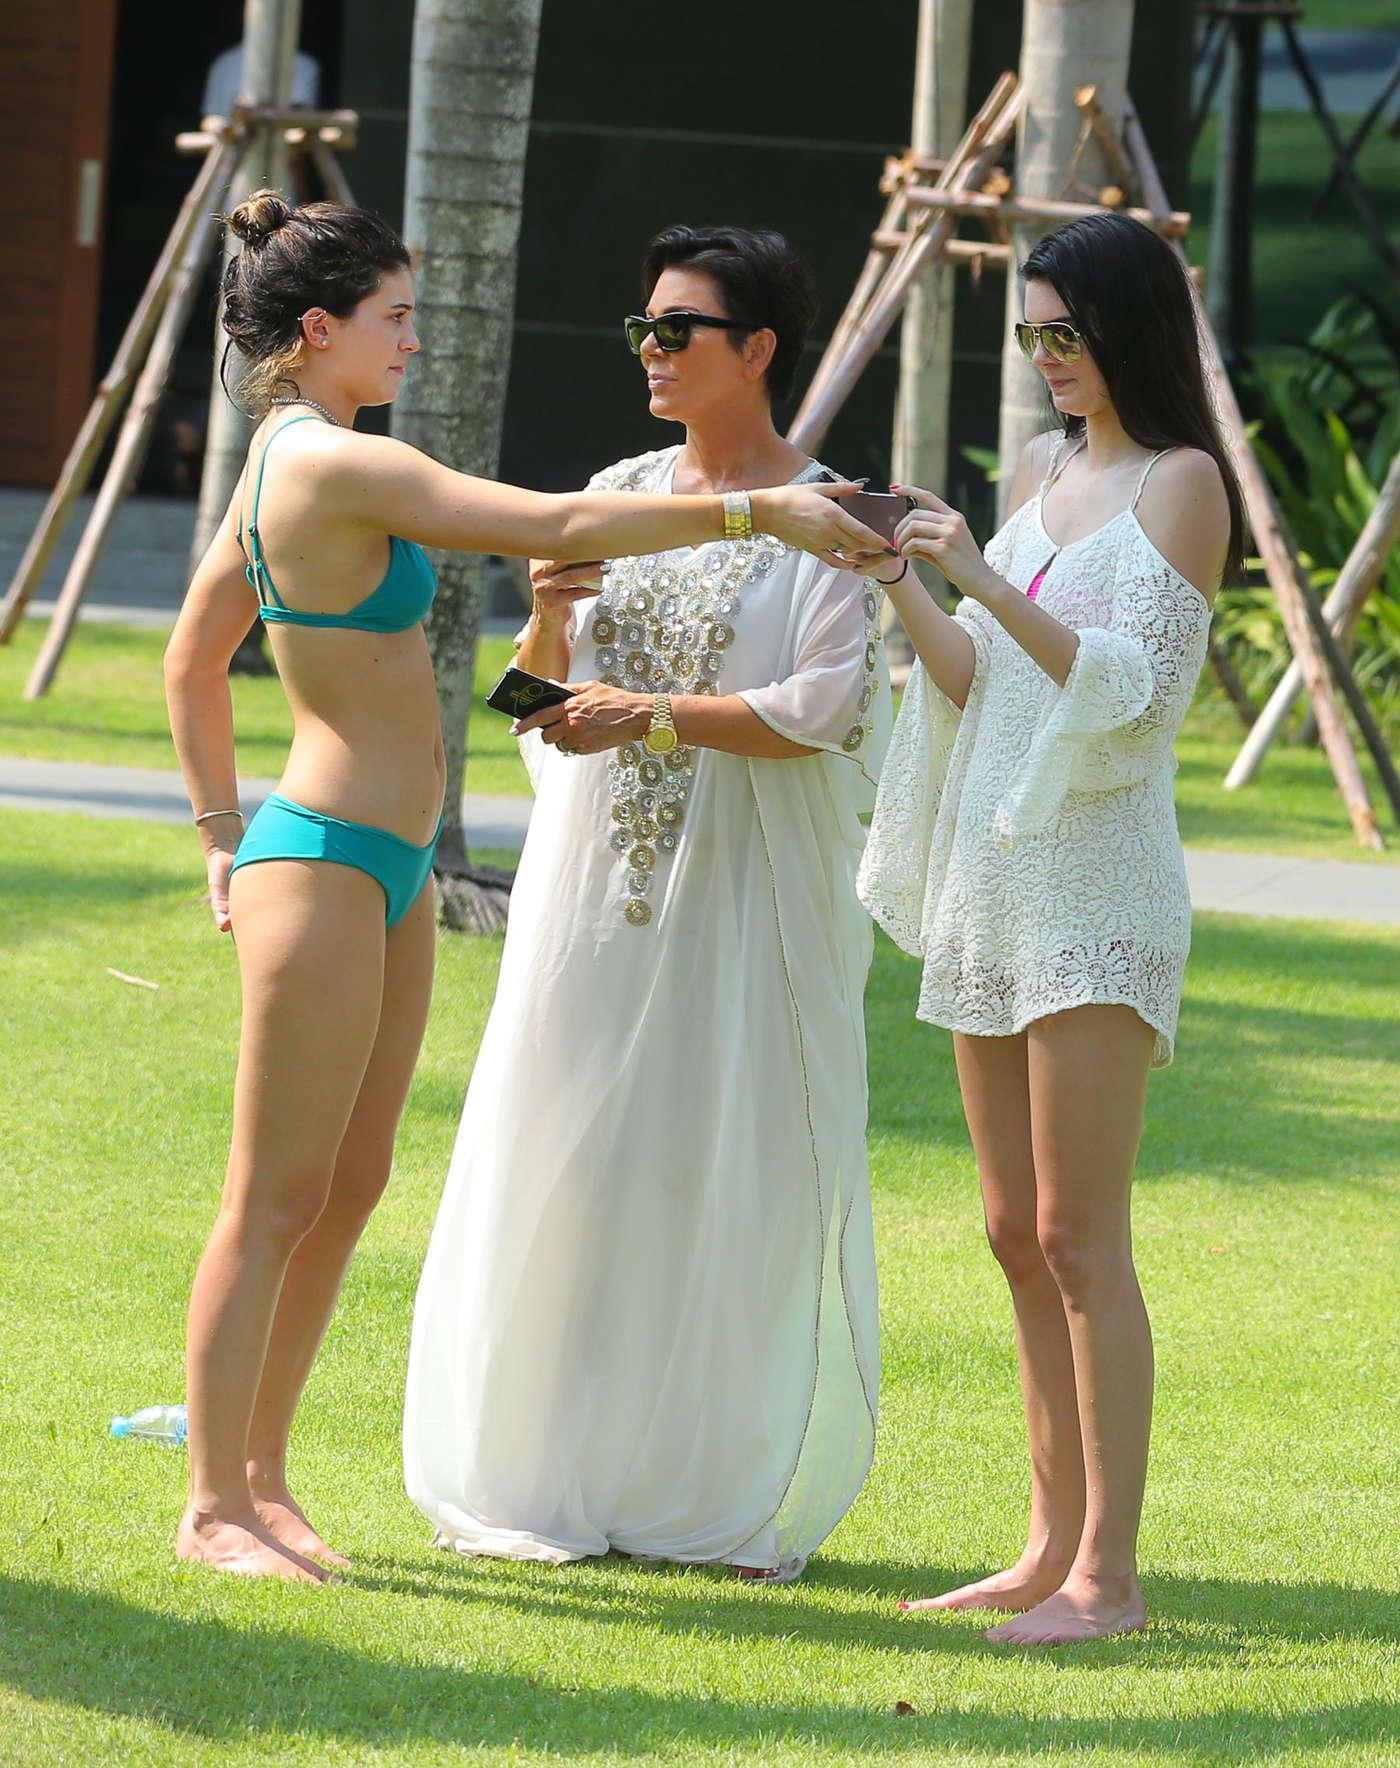 Kylie Jenner Bikini Photos: 2014 Thailand -01 | GotCeleb